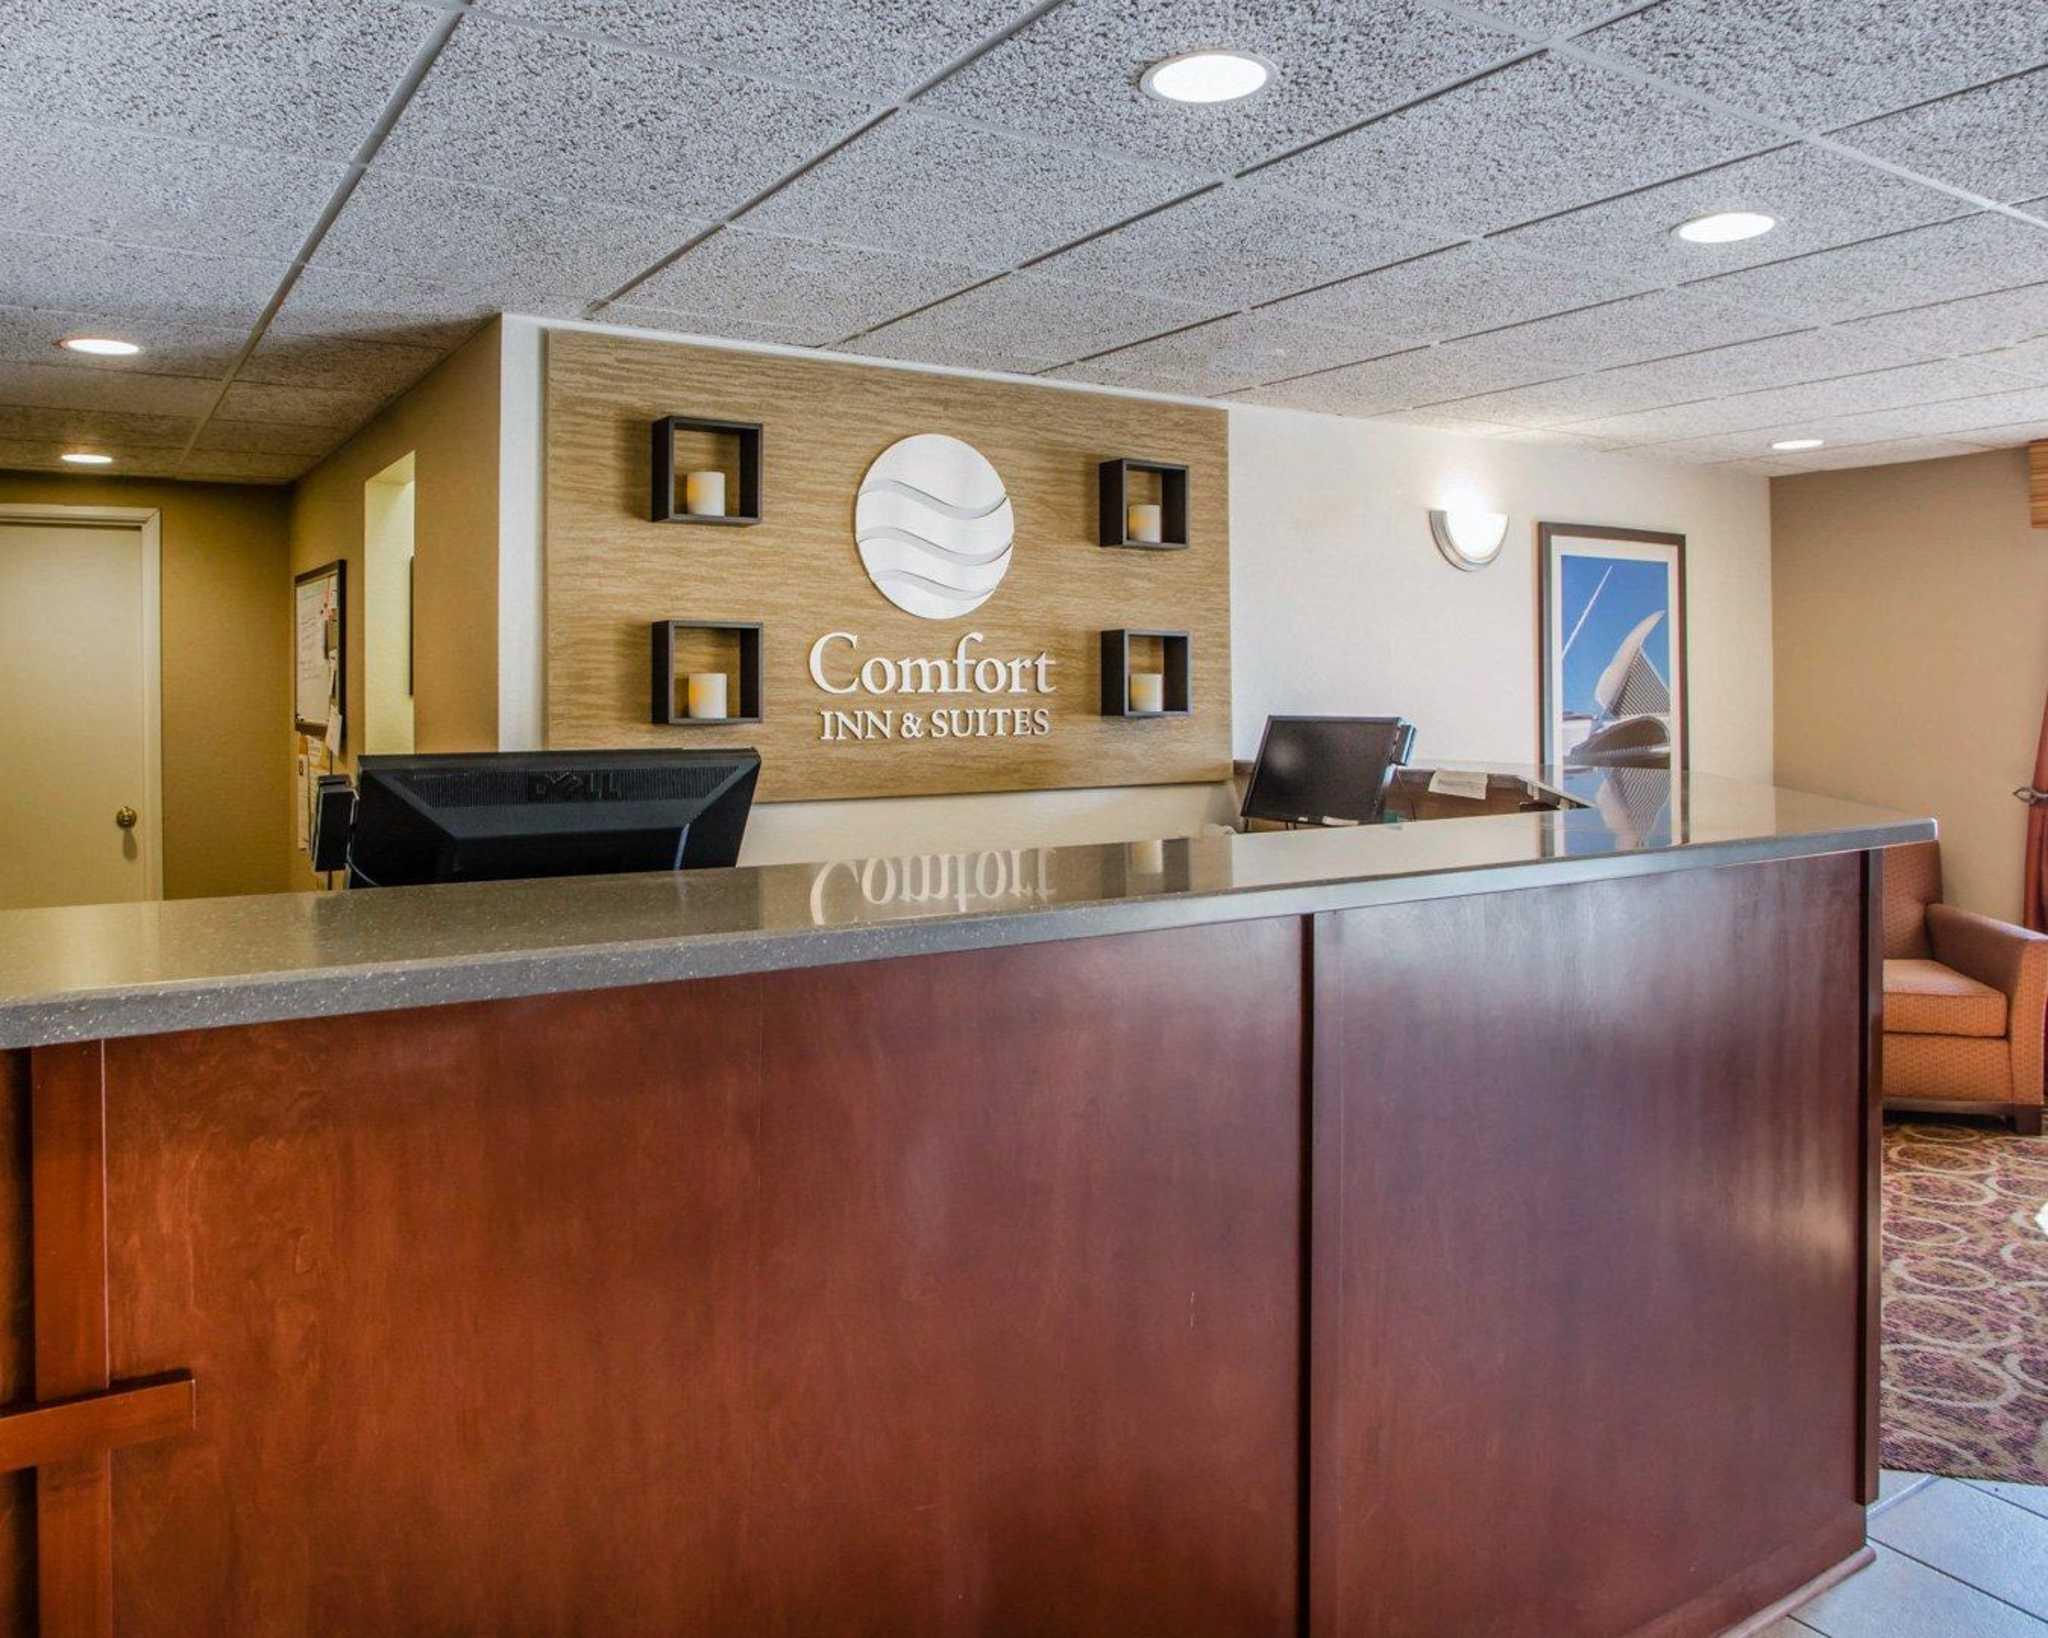 Comfort Inn & Suites Jackson - West Bend image 21